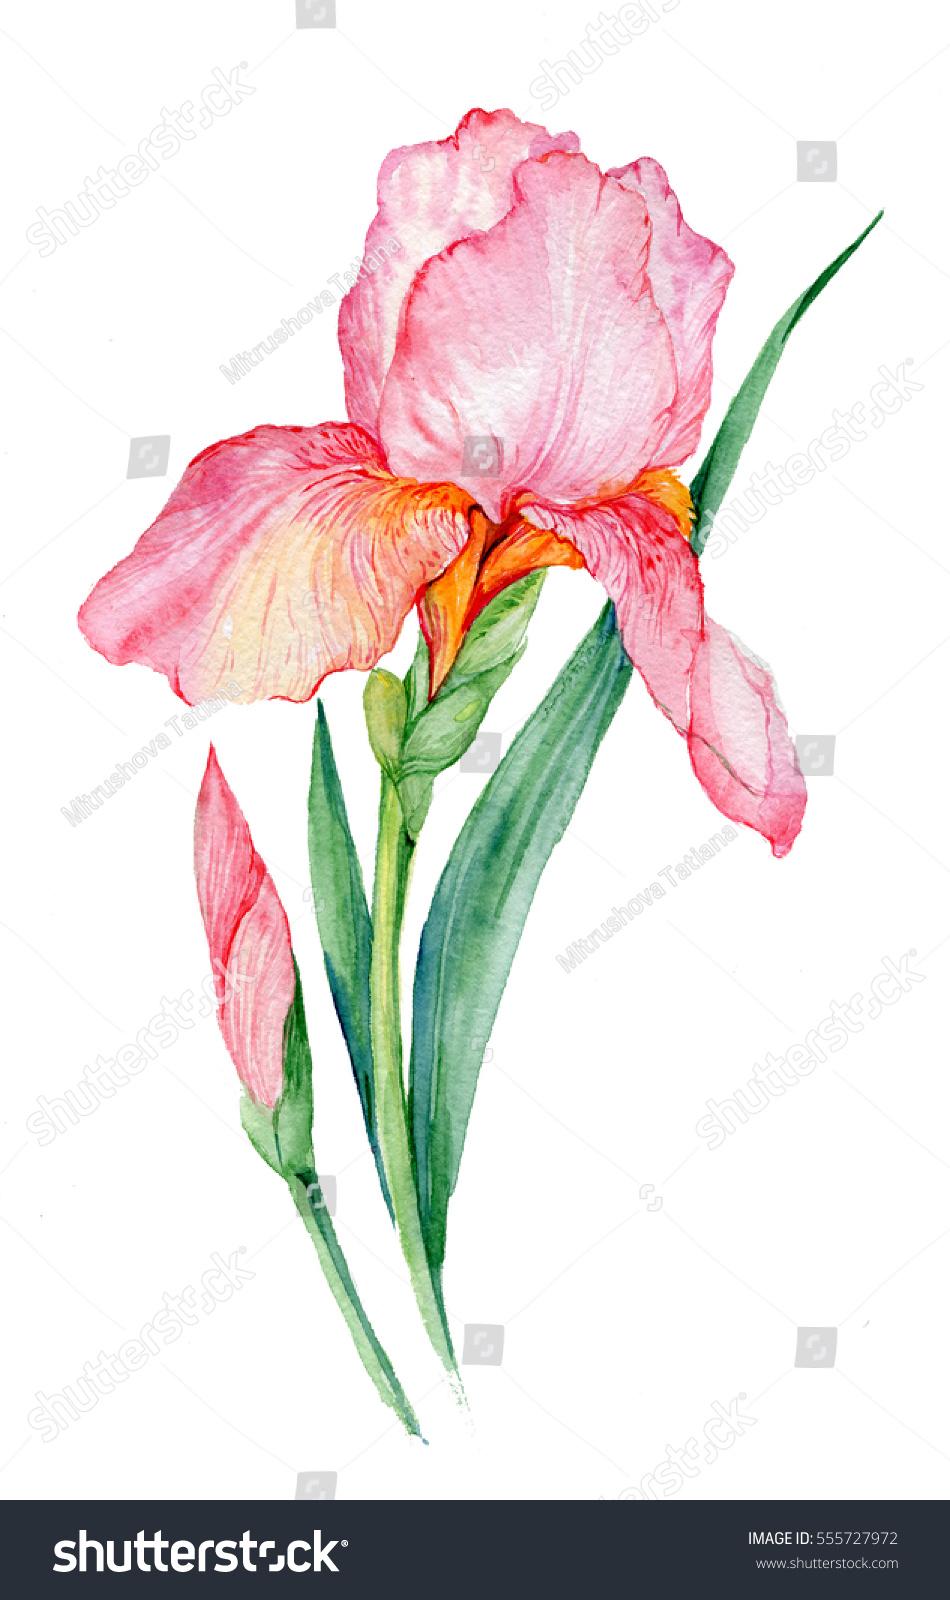 Royalty Free Stock Illustration Of Pink Iris Illustration Watercolor